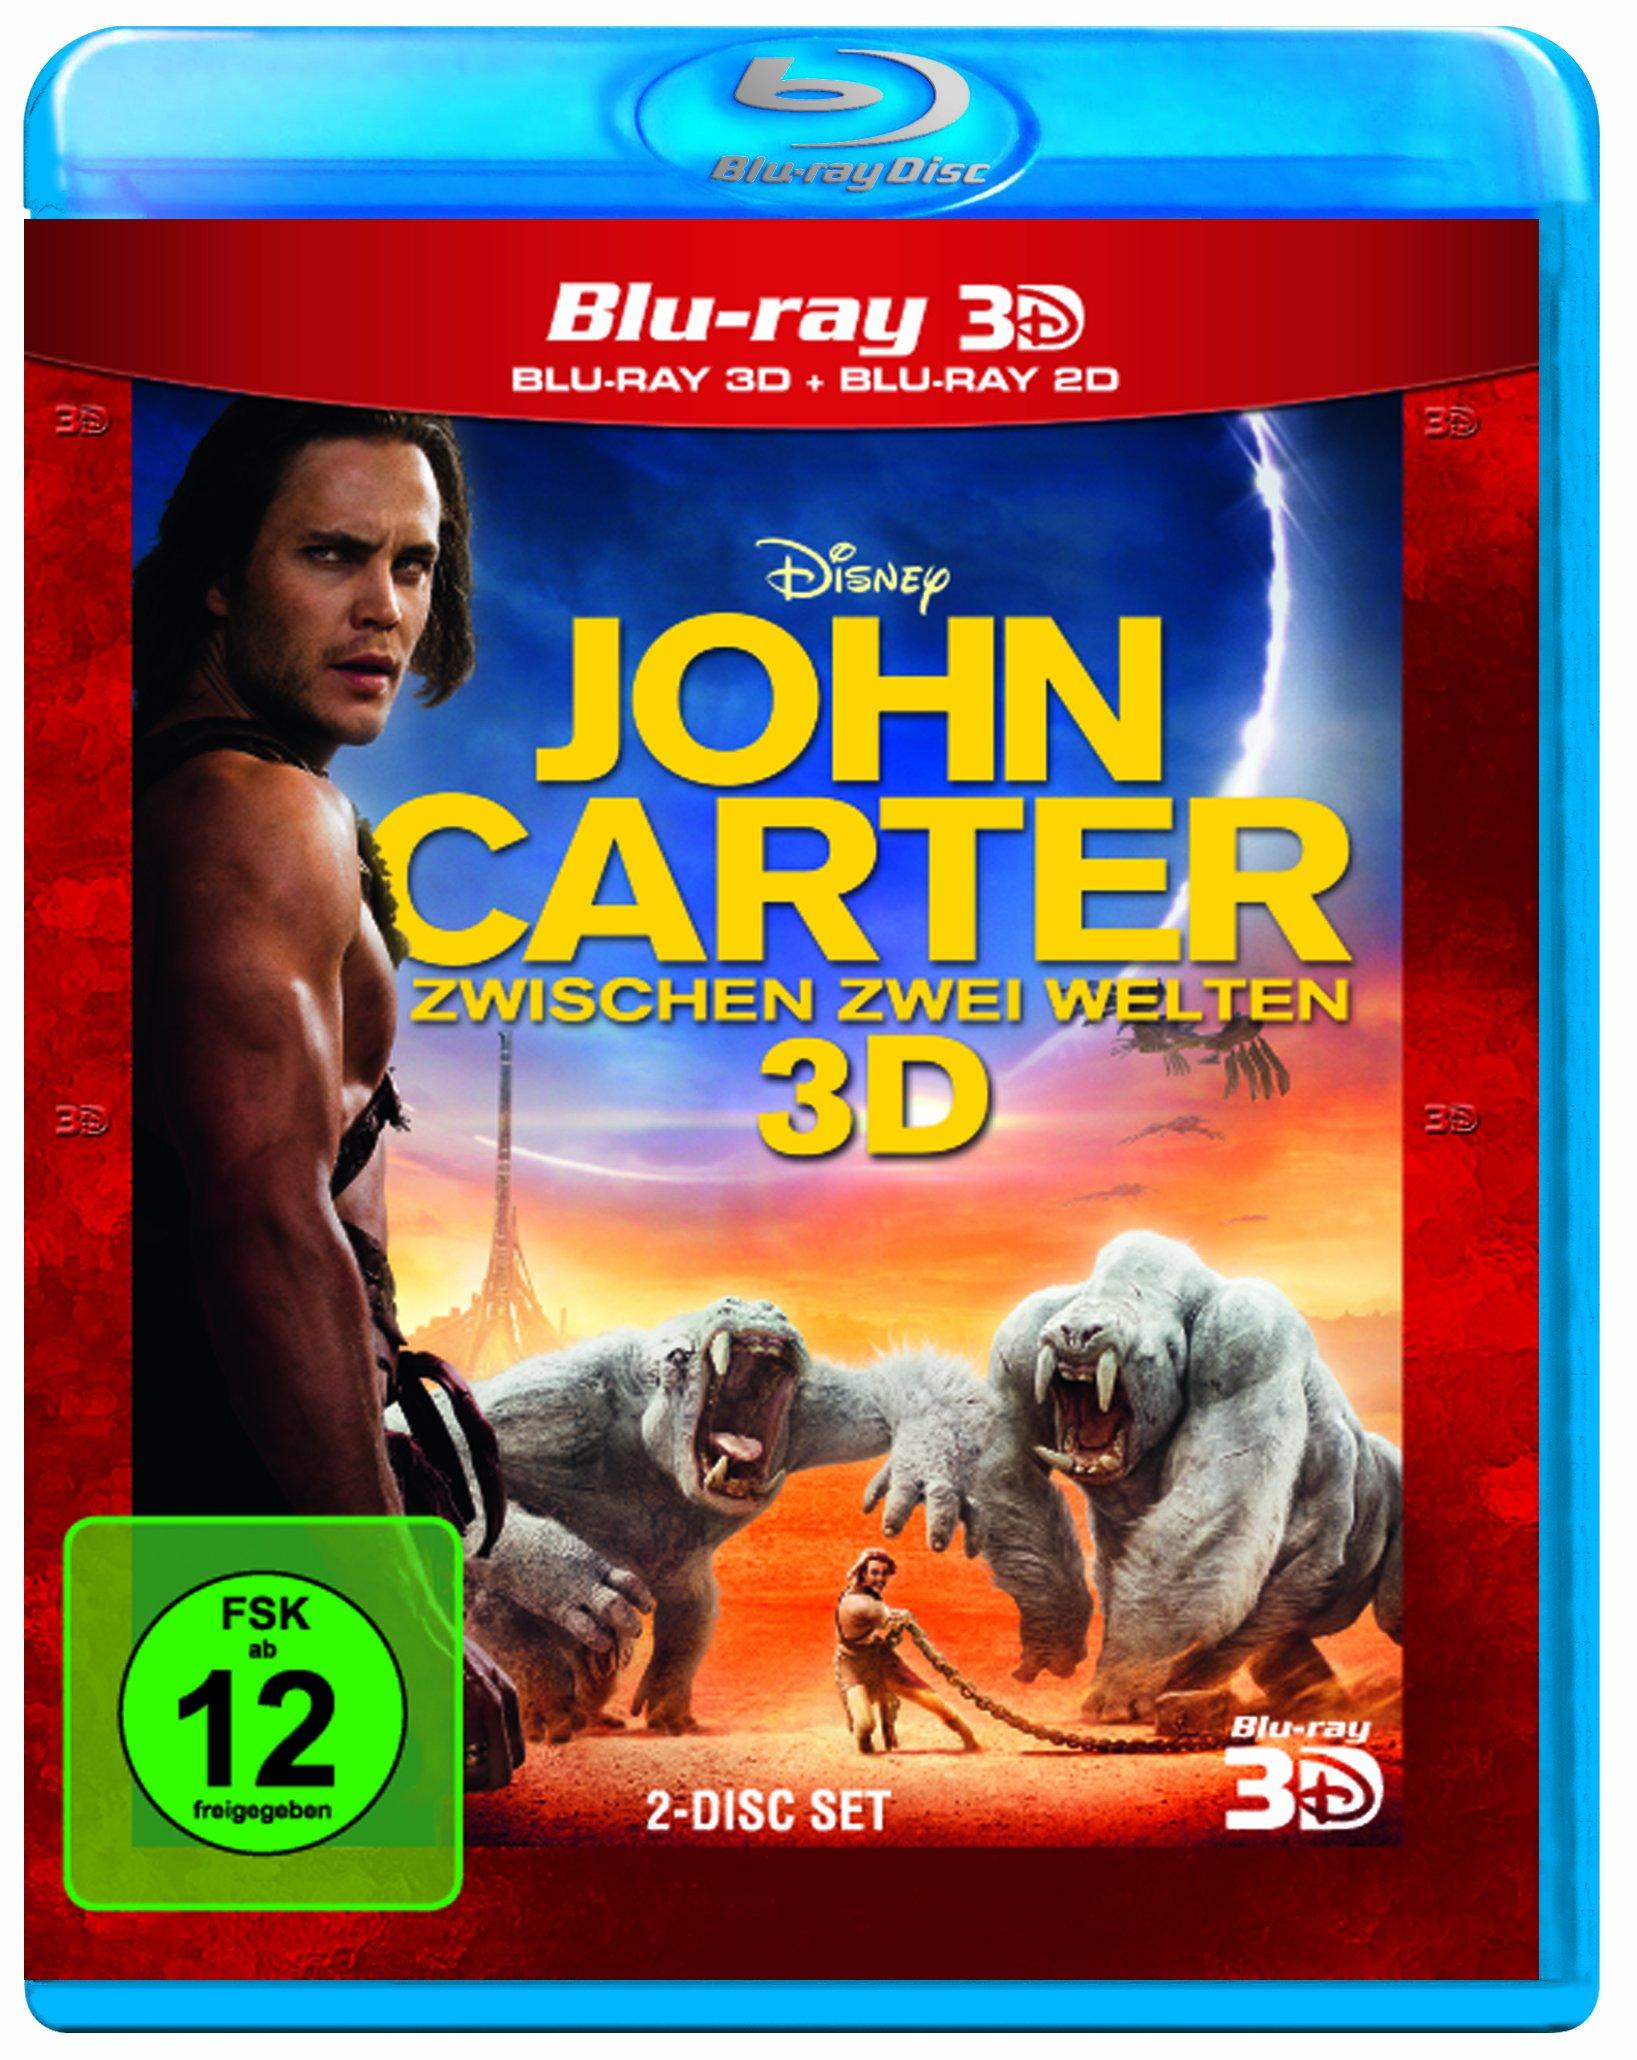 download John.Carter.2012.3D.H-SBS.German.DTS.DL.1080p.BluRay.x264-LeetHD